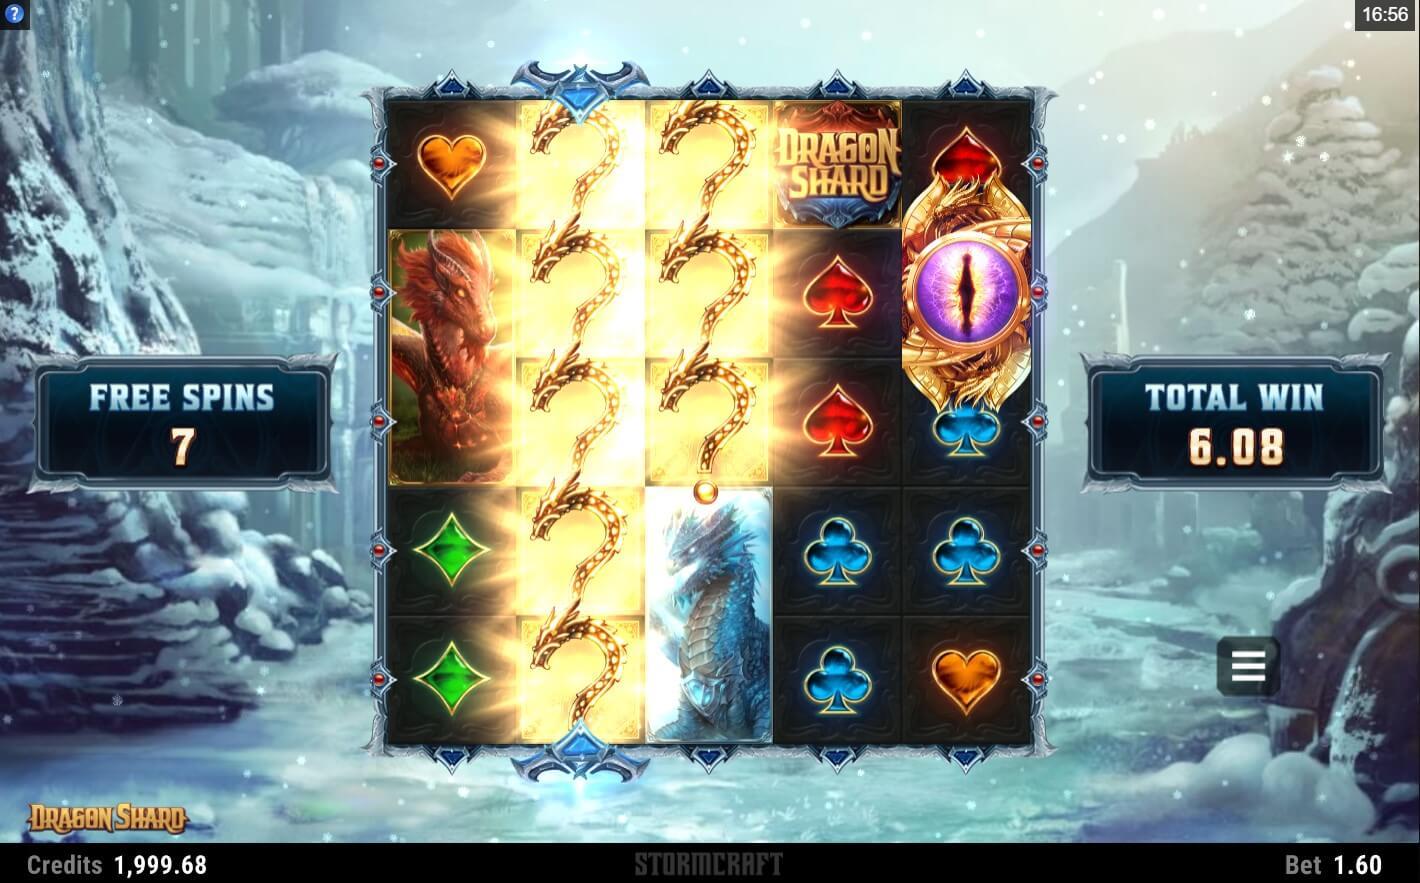 Dragon Shard Slot Gameplay